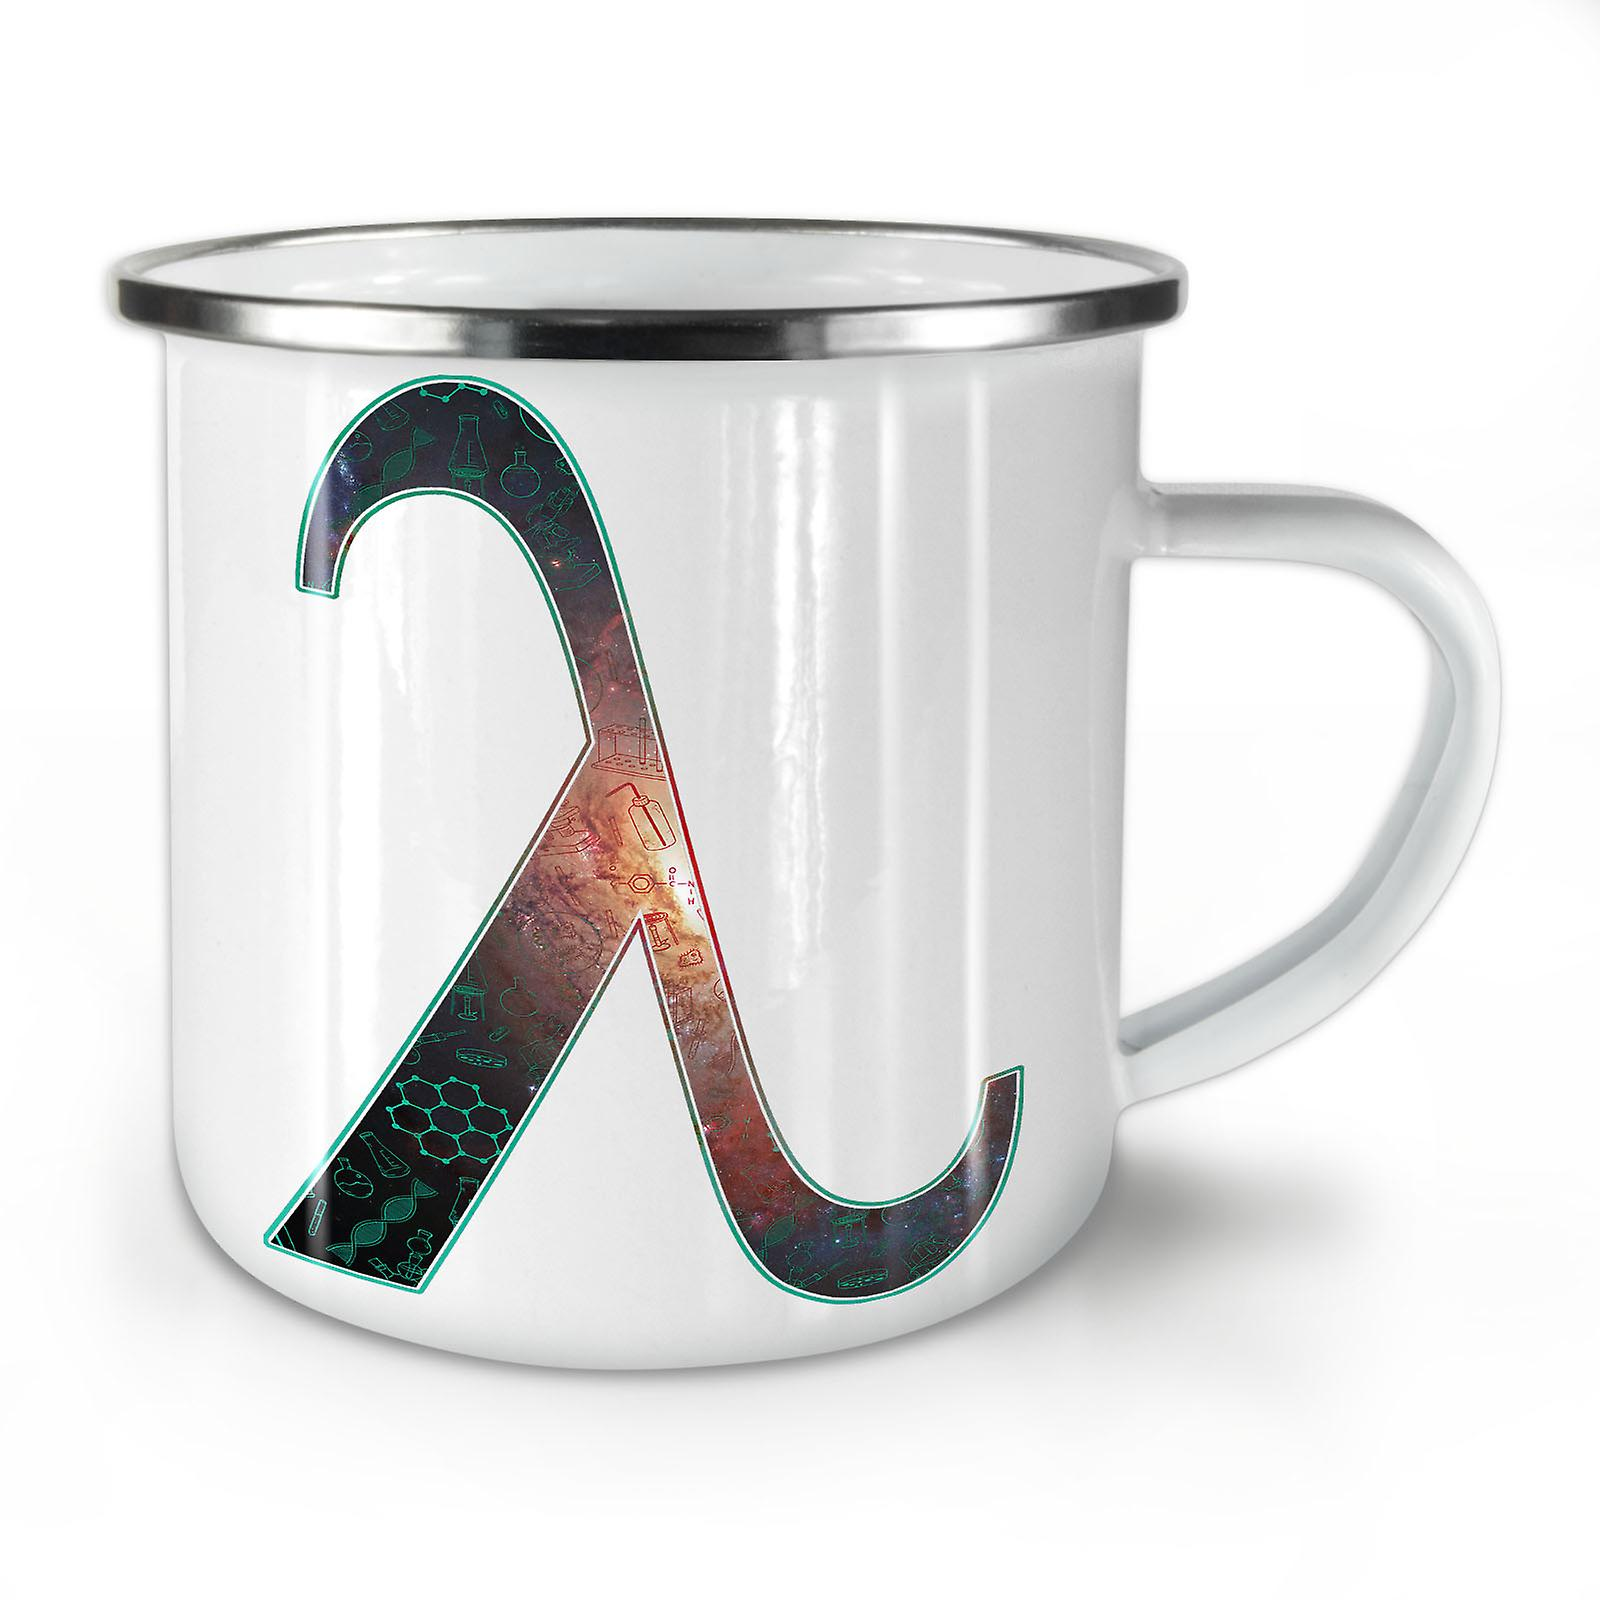 Space Smart Lambda Mug10 OzWellcoda Enamel Whitetea Geek Coffee New 54ASLc3Rqj